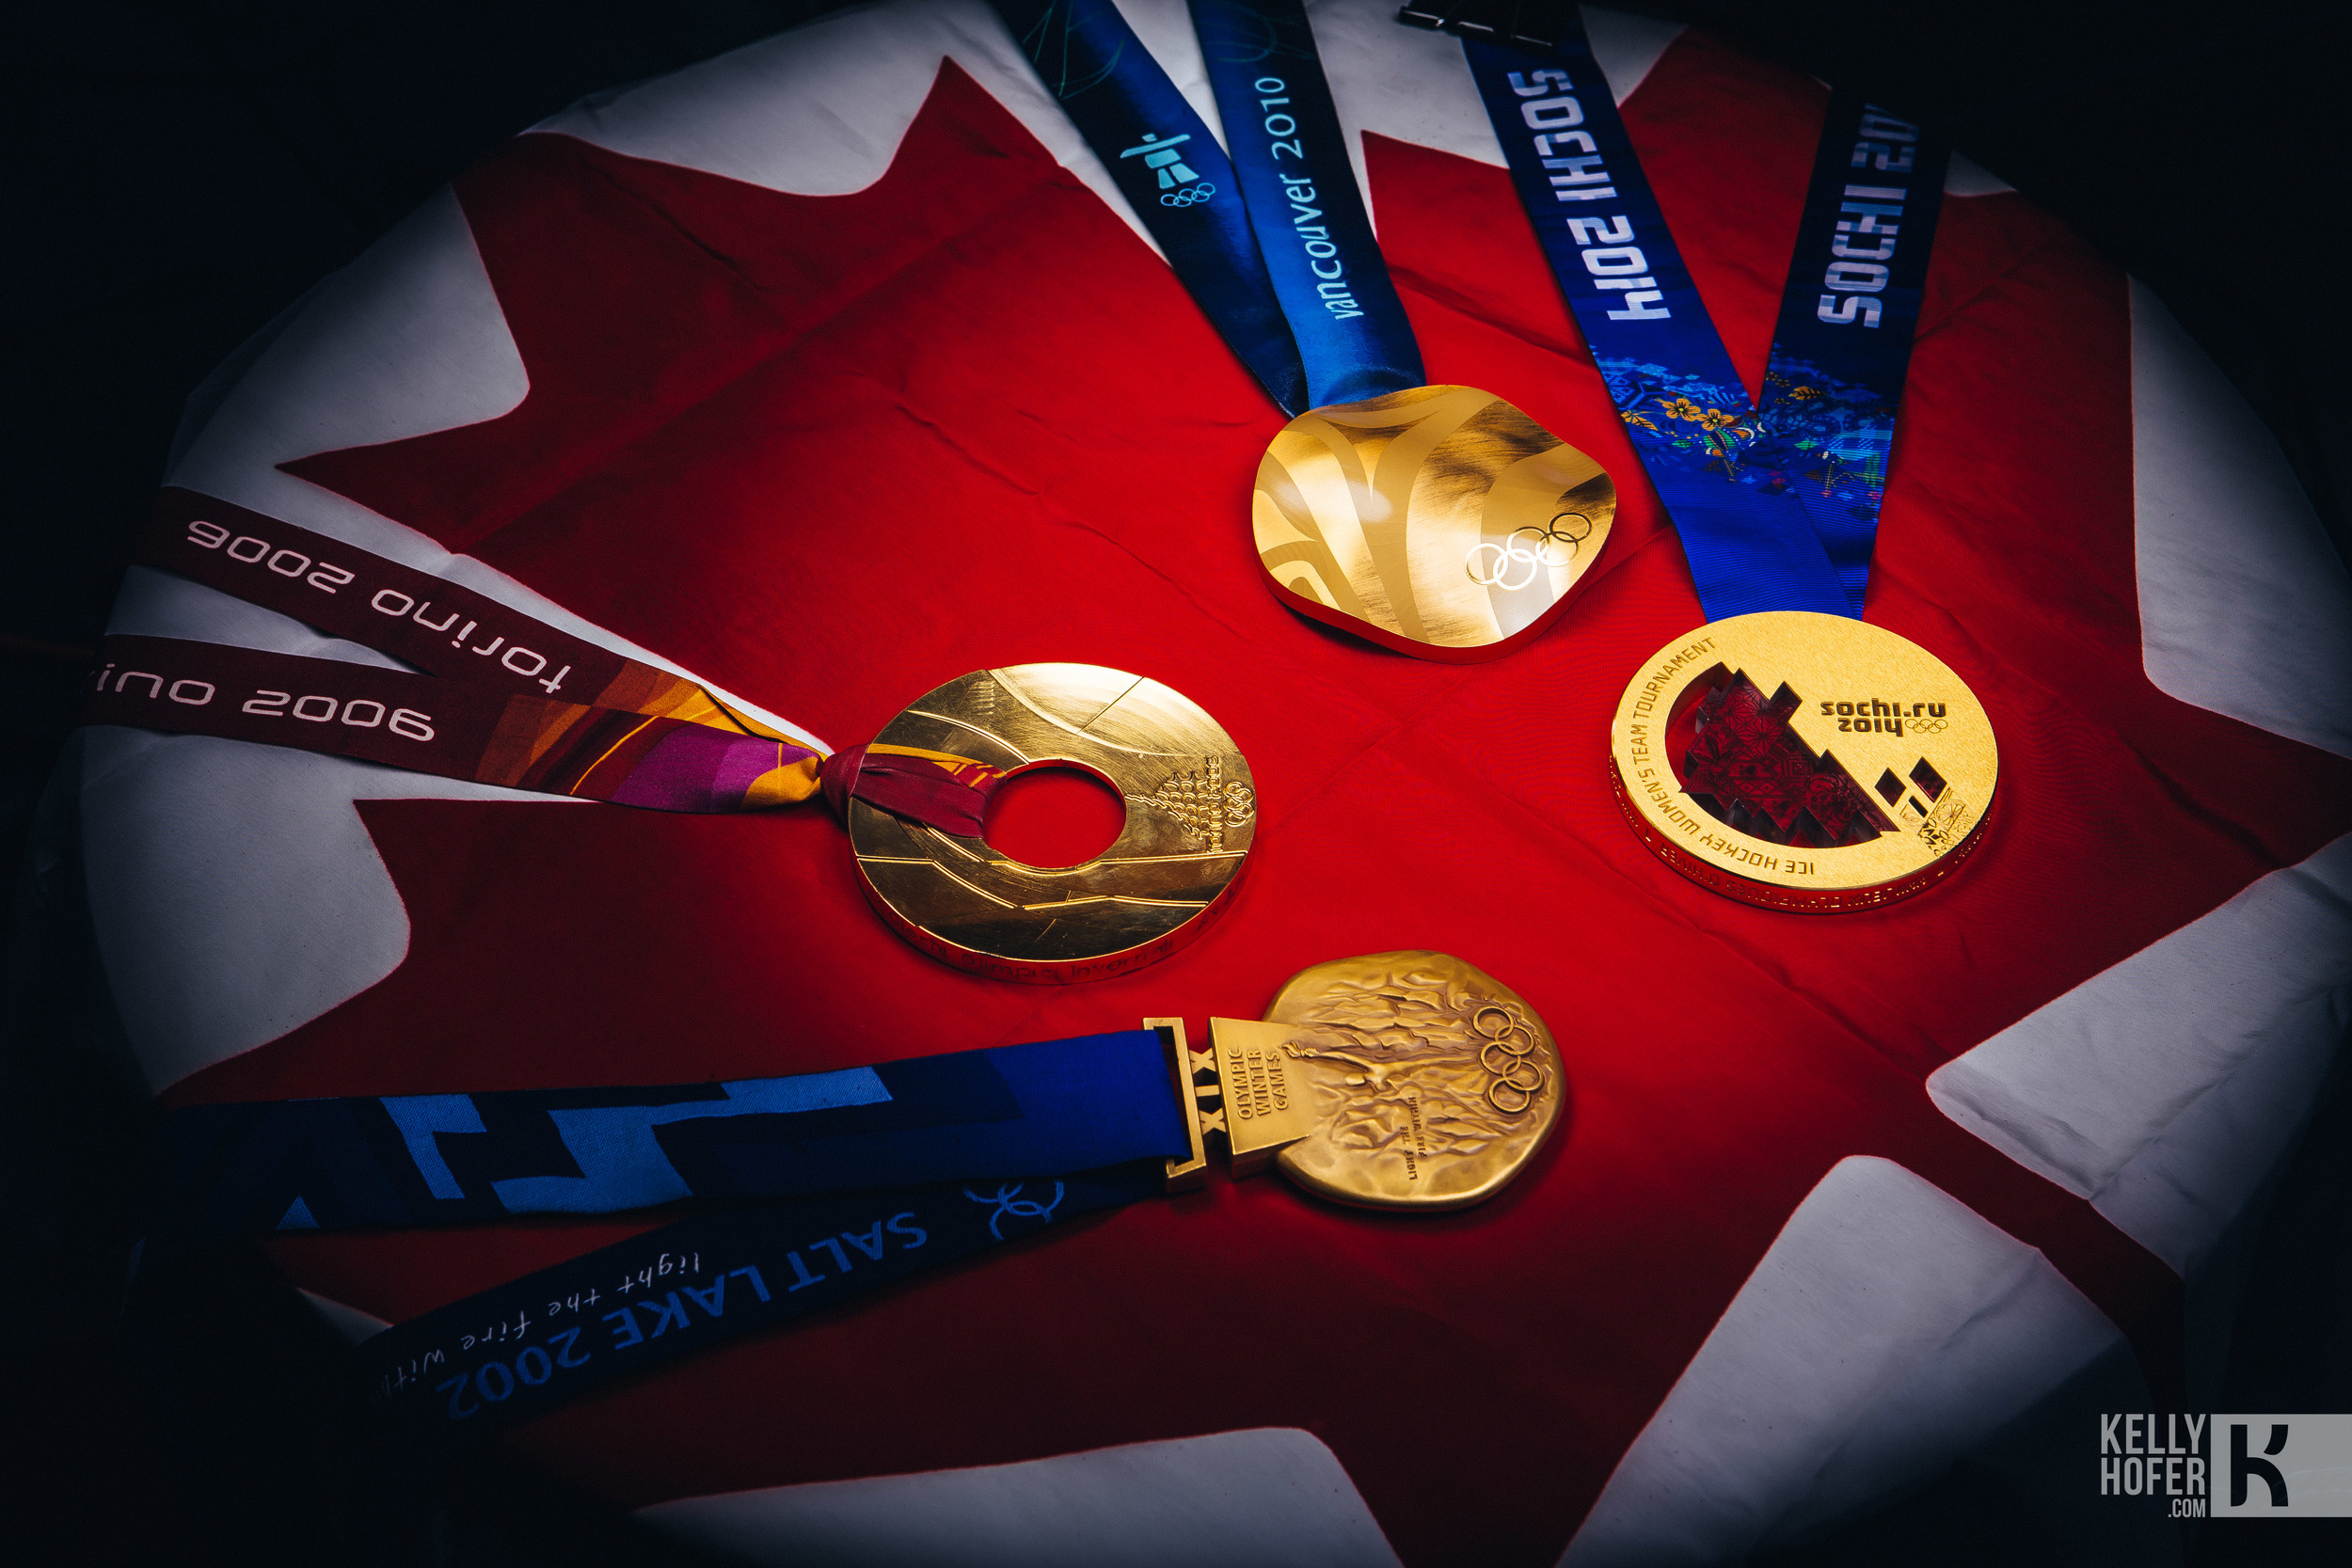 Image copyright: Hockeycanada.ca